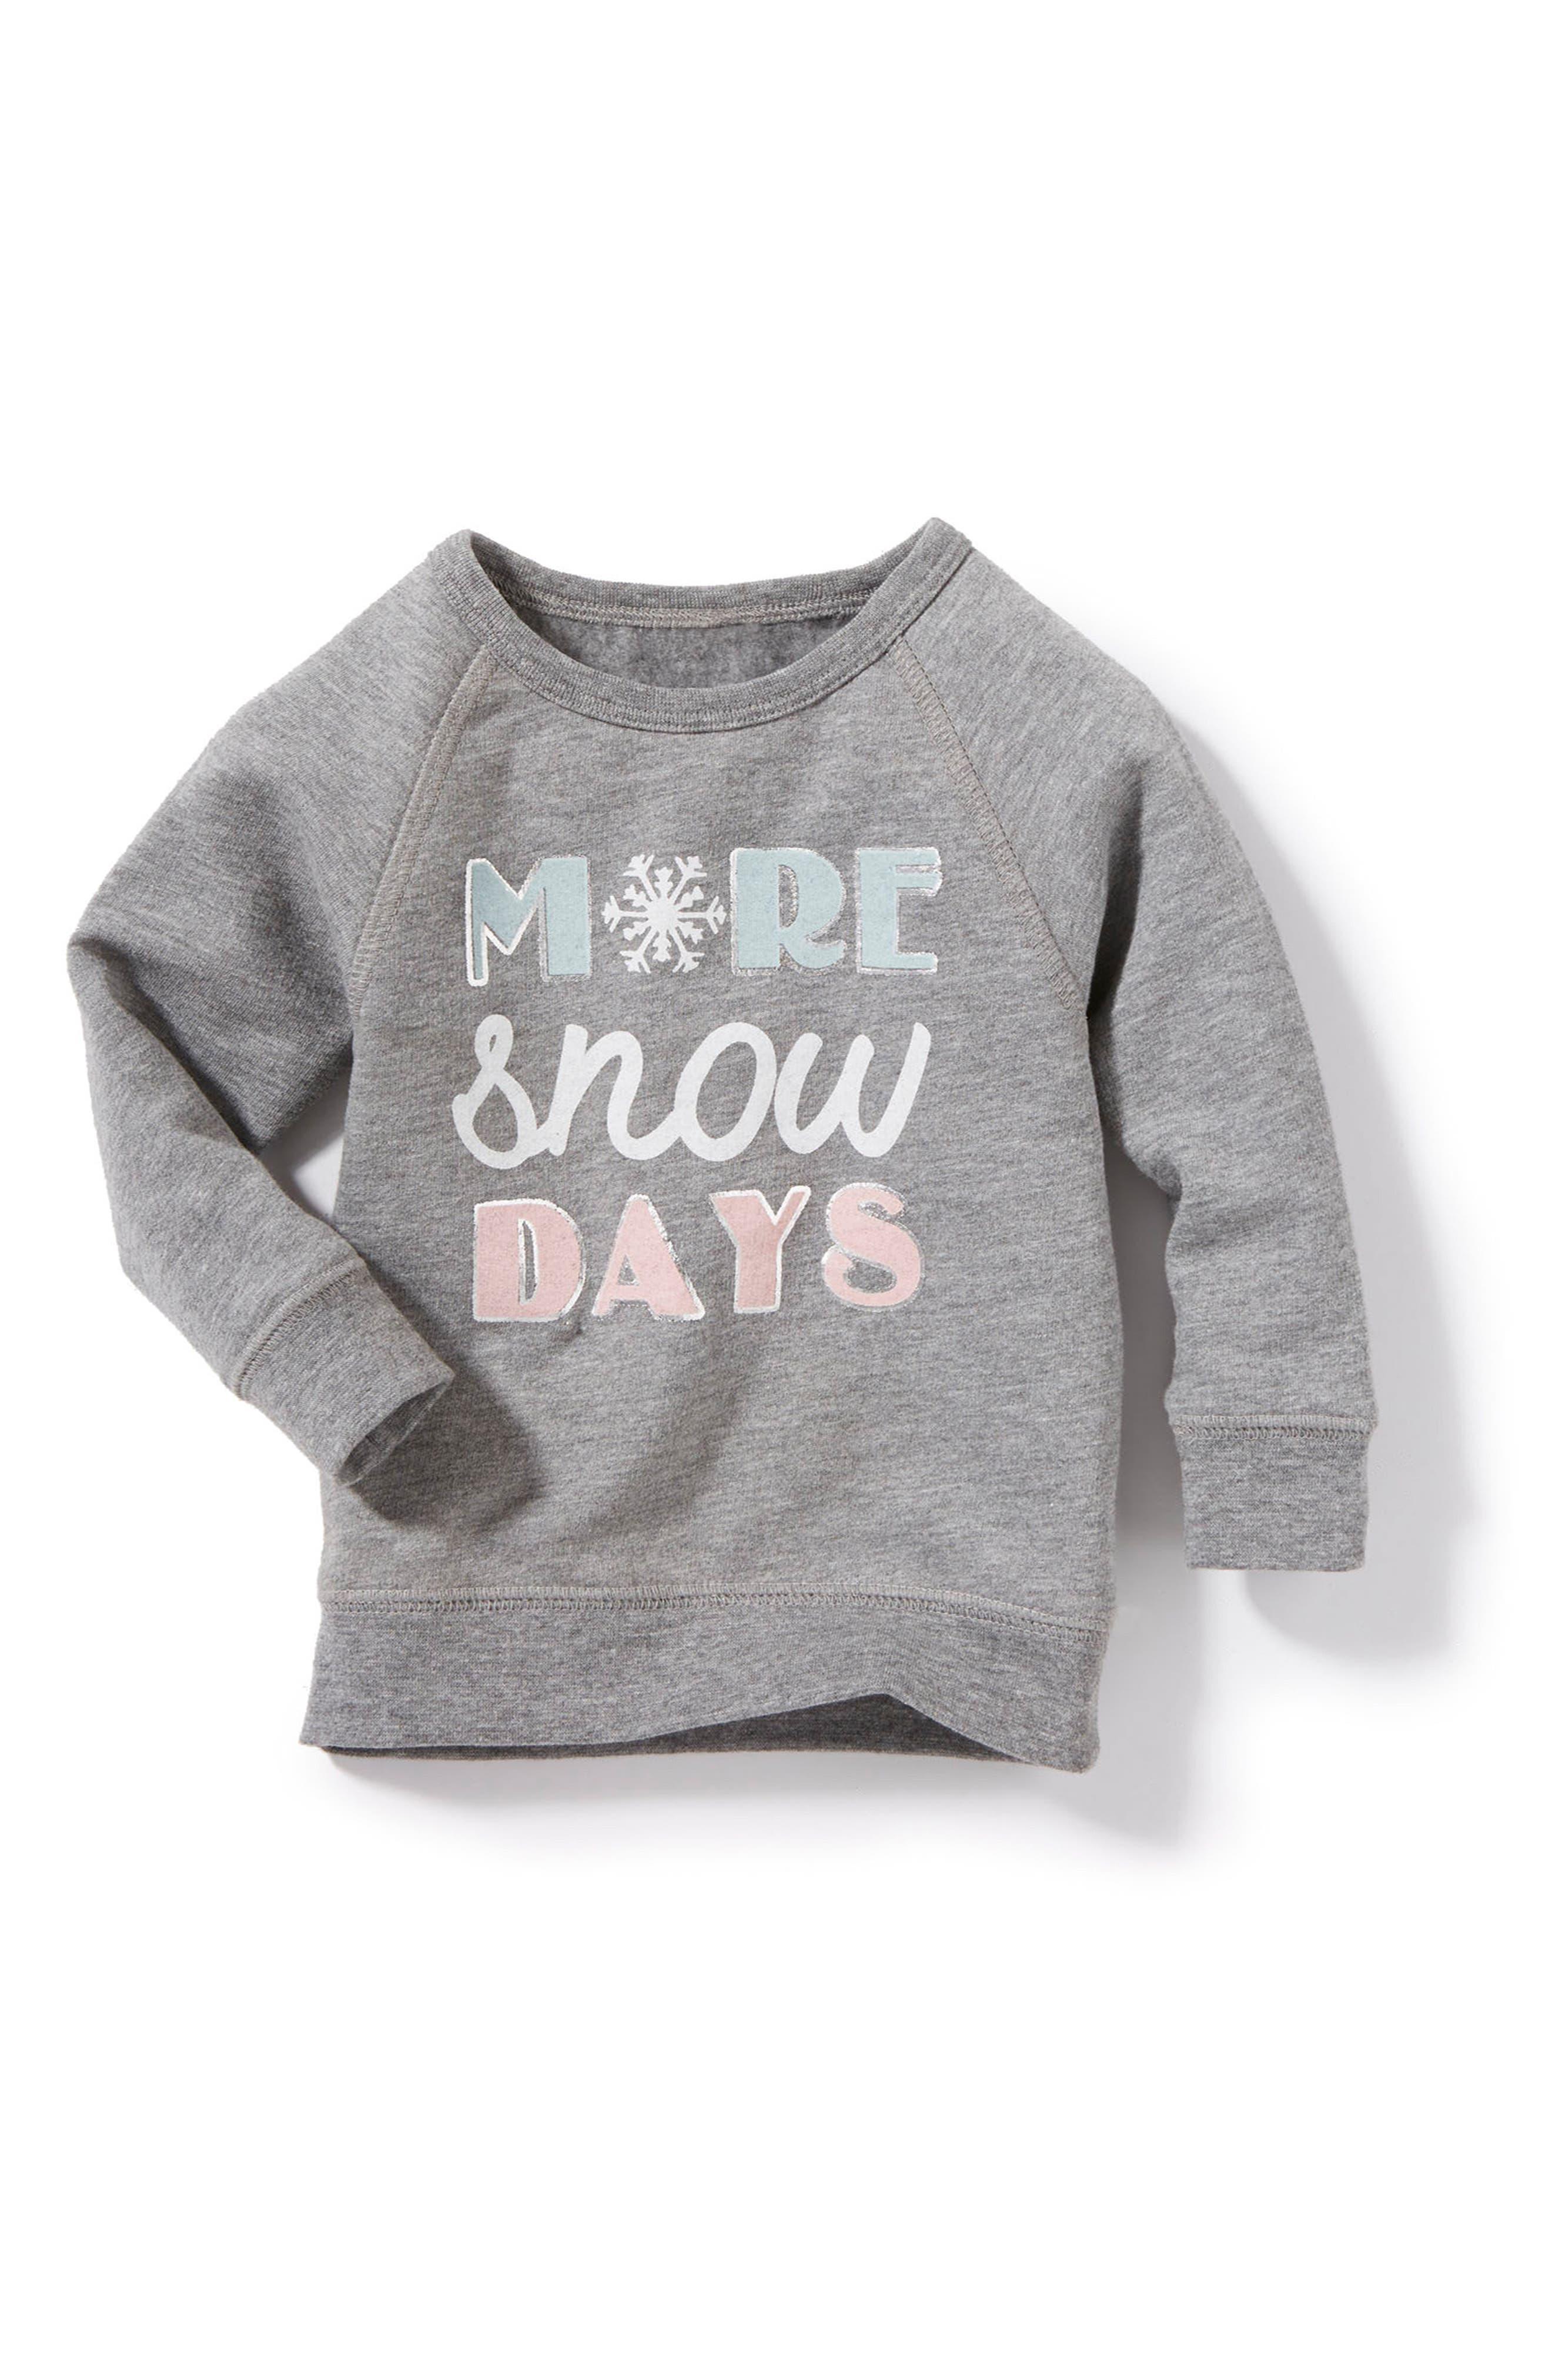 Peek Snow Days Graphic Pullover (Baby Girls)